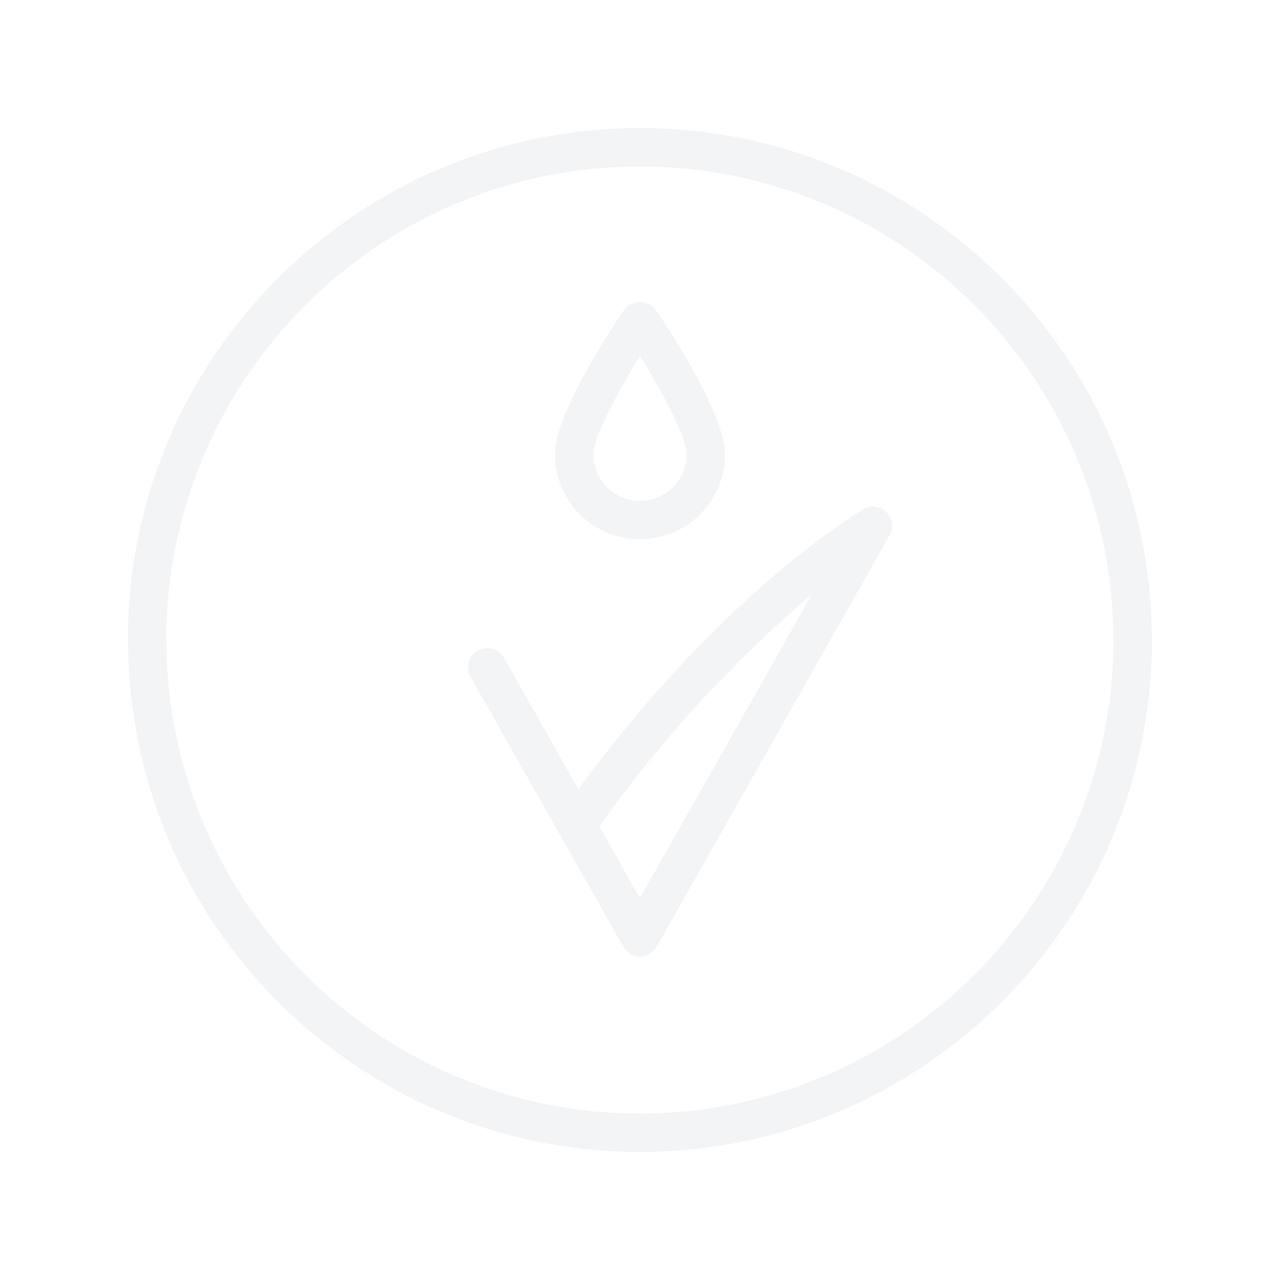 BATISTE Dry Shampoo Bare 200ml